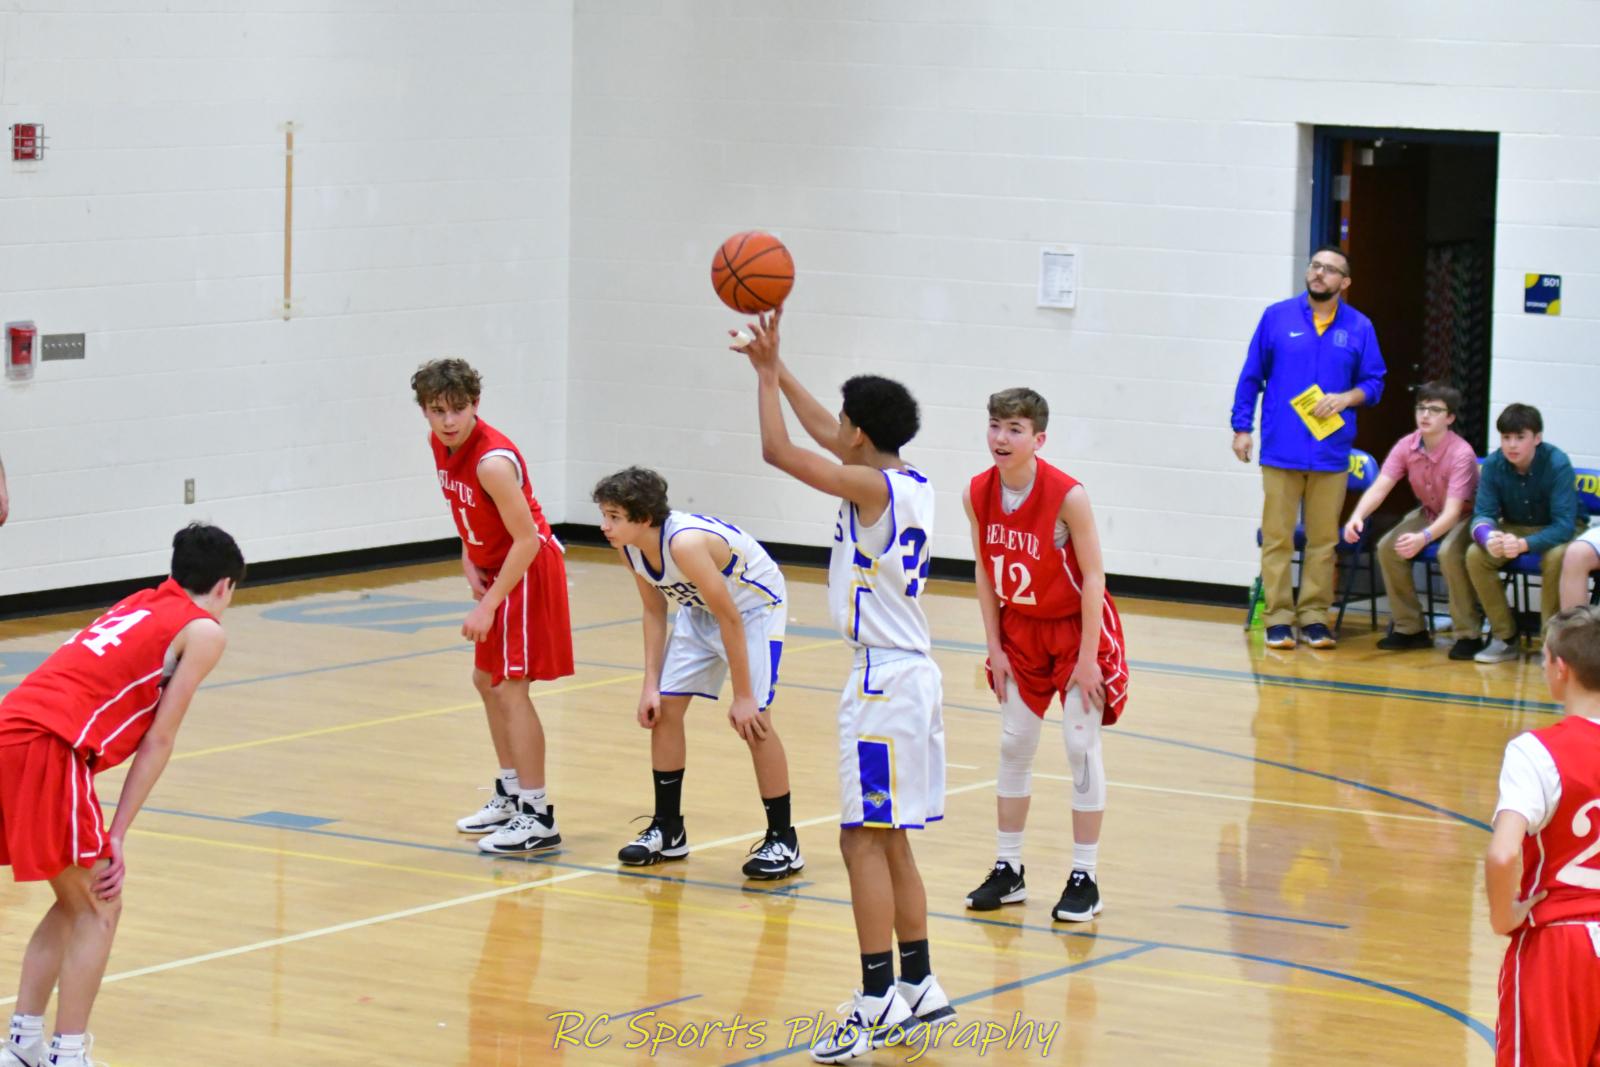 SBC MS Basketball Tourney continues!